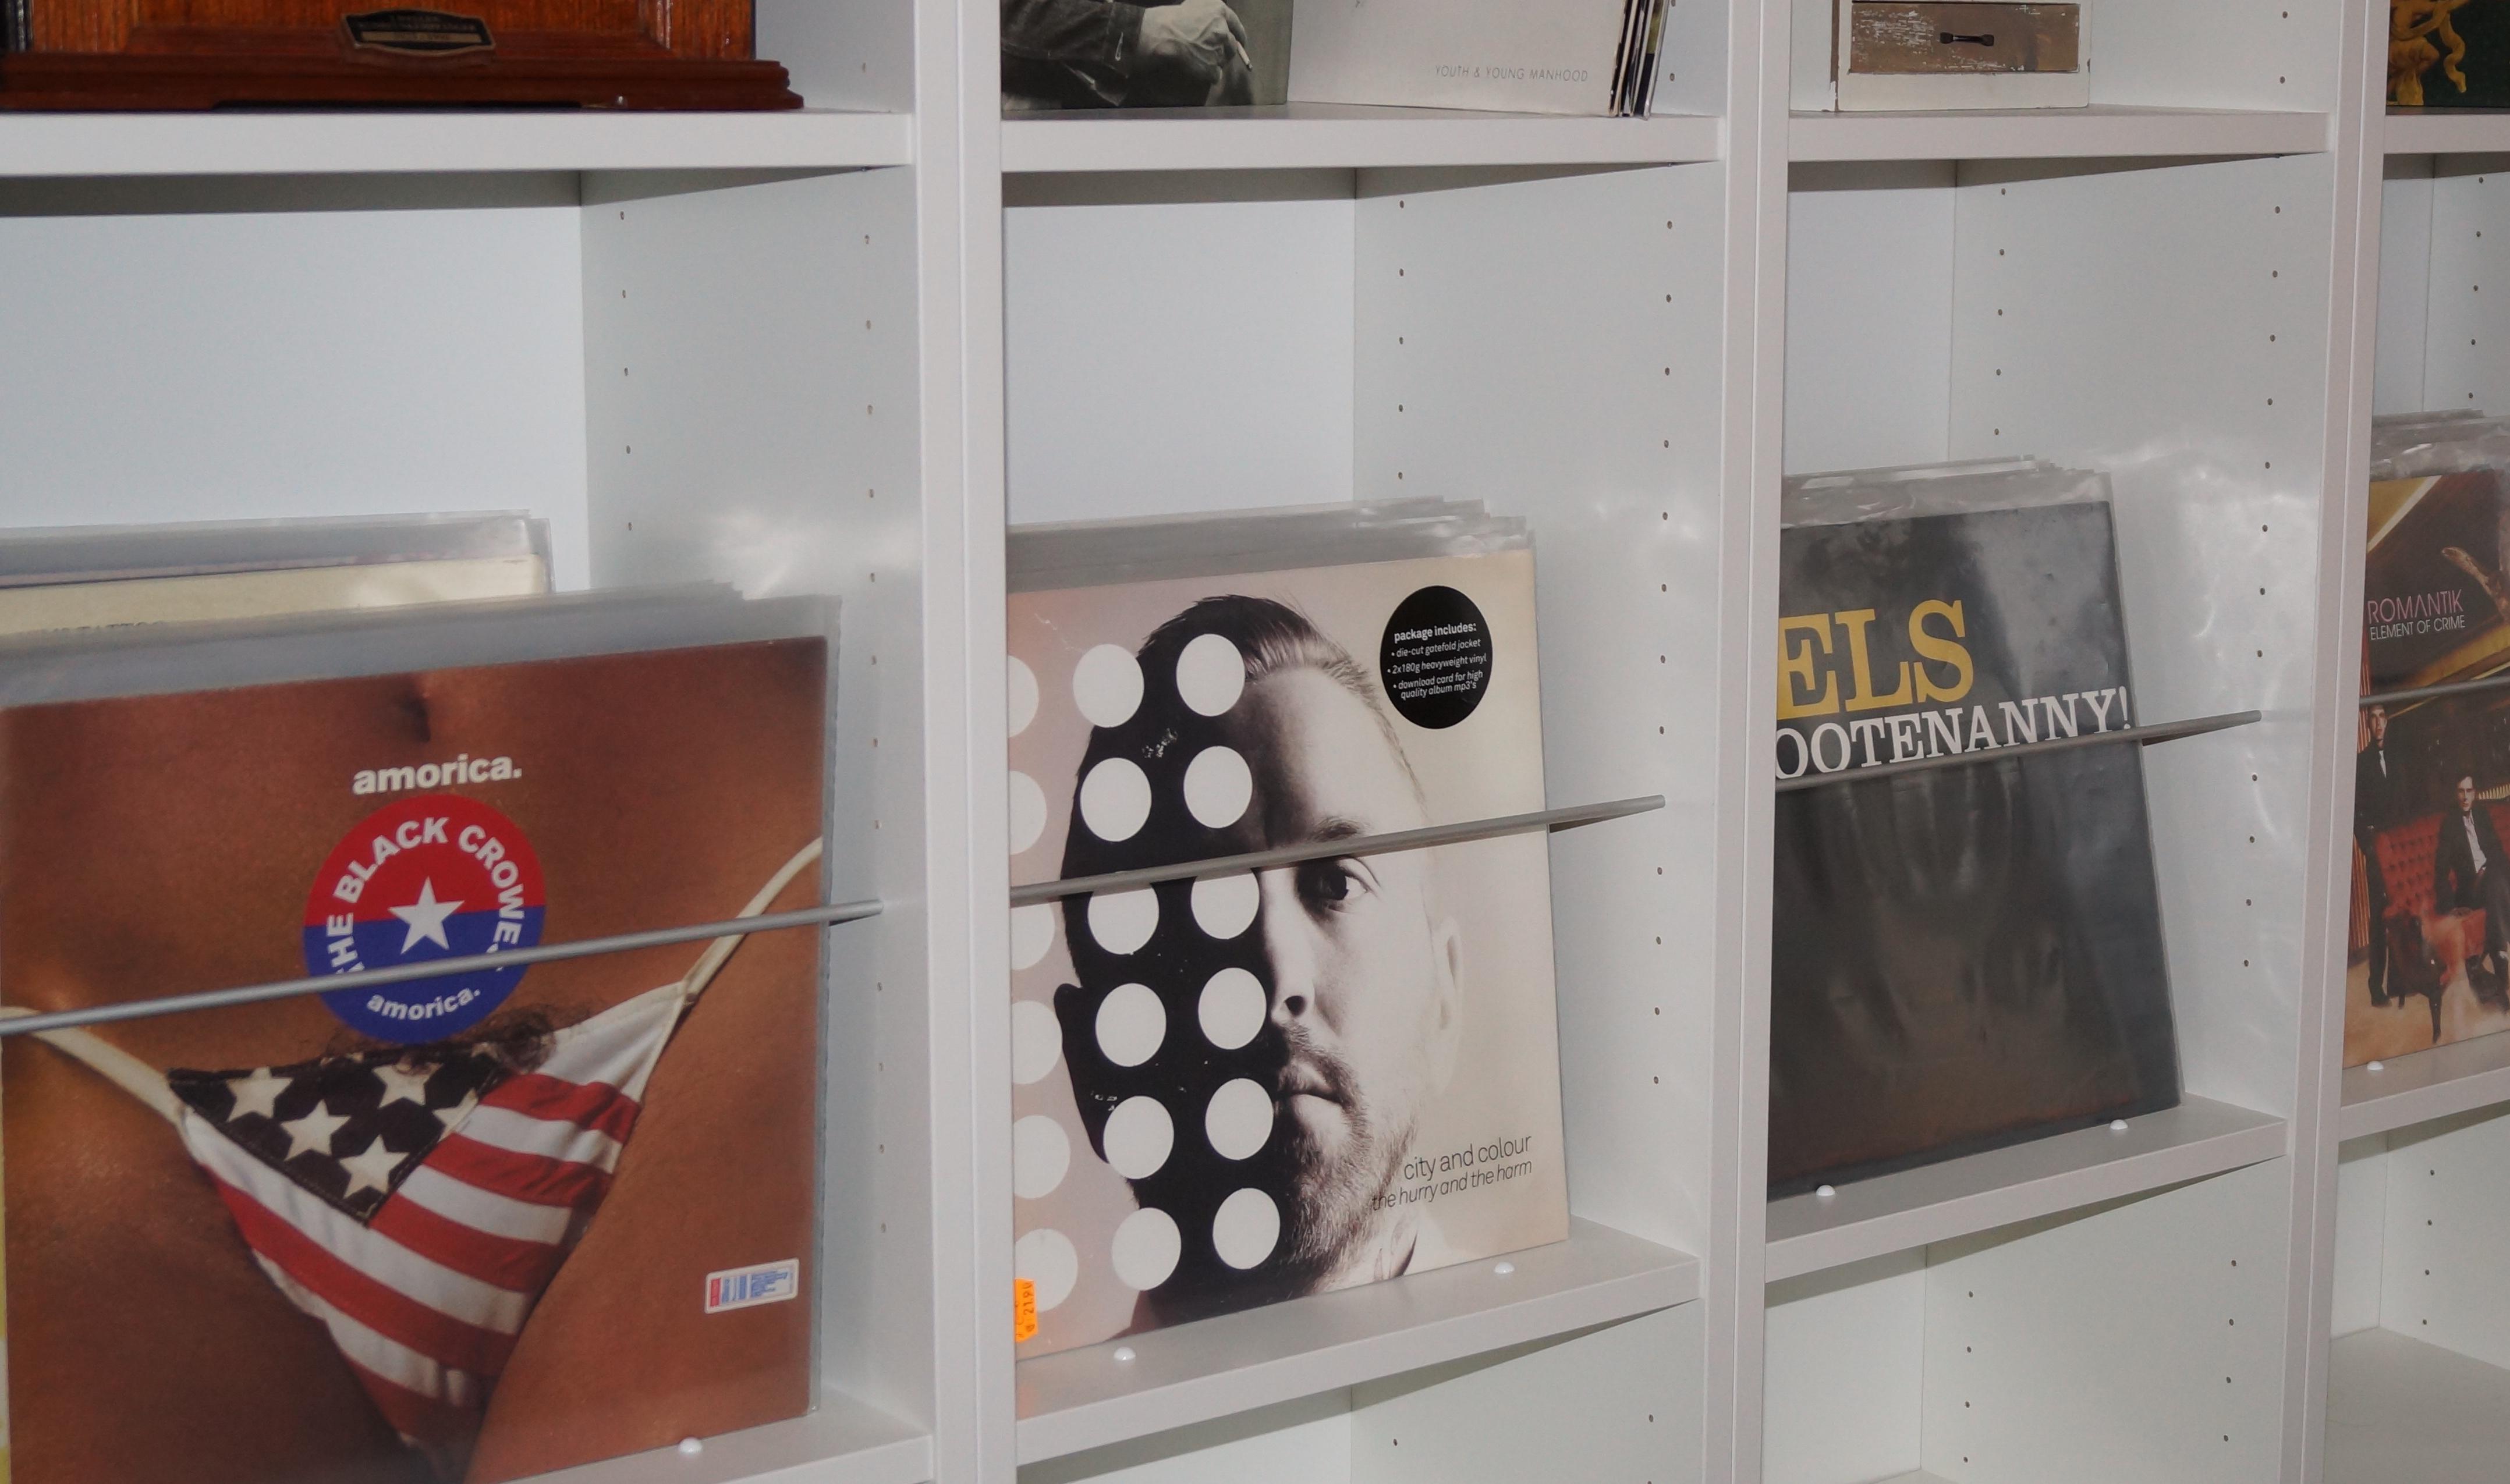 neuheit das schallplattenregal plattenregal lp regal. Black Bedroom Furniture Sets. Home Design Ideas